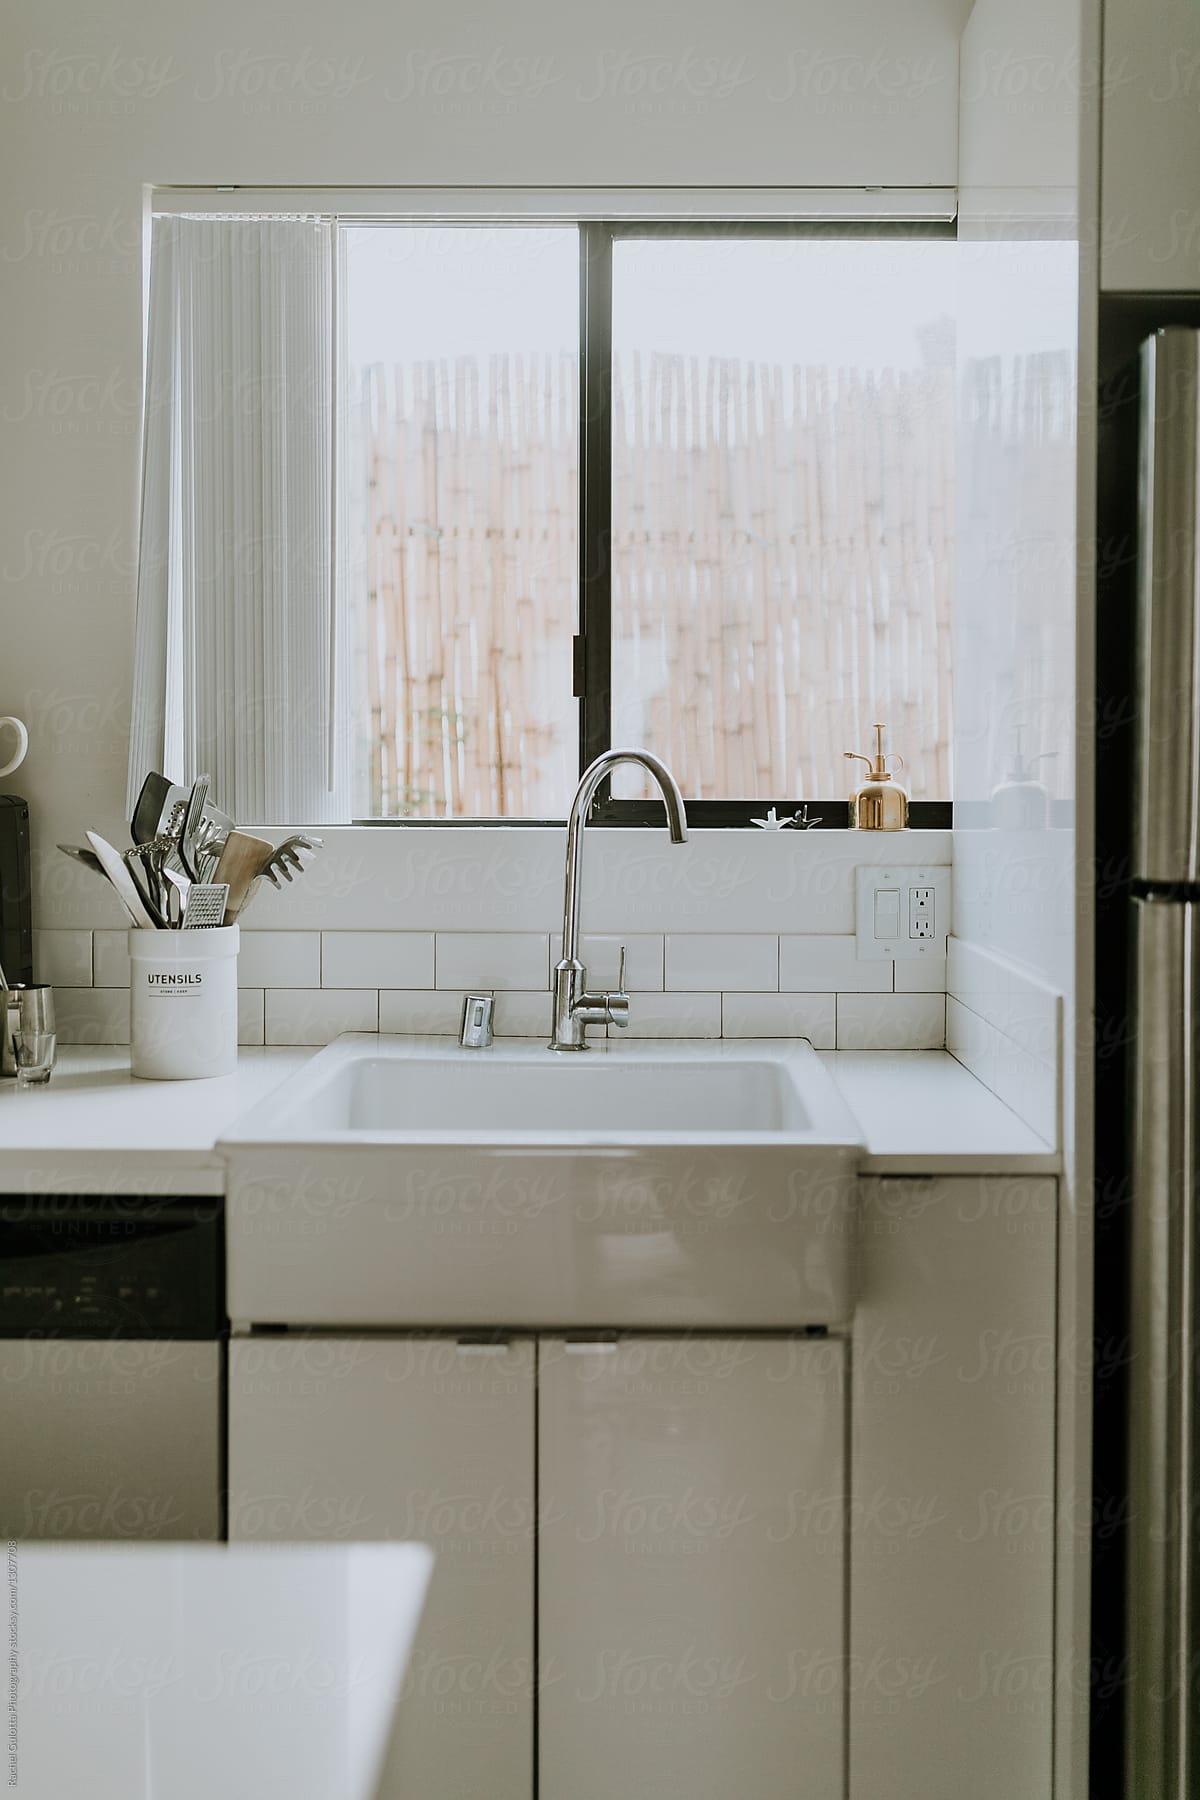 Farm Sink In A White Kitchen By Mango Street Lab